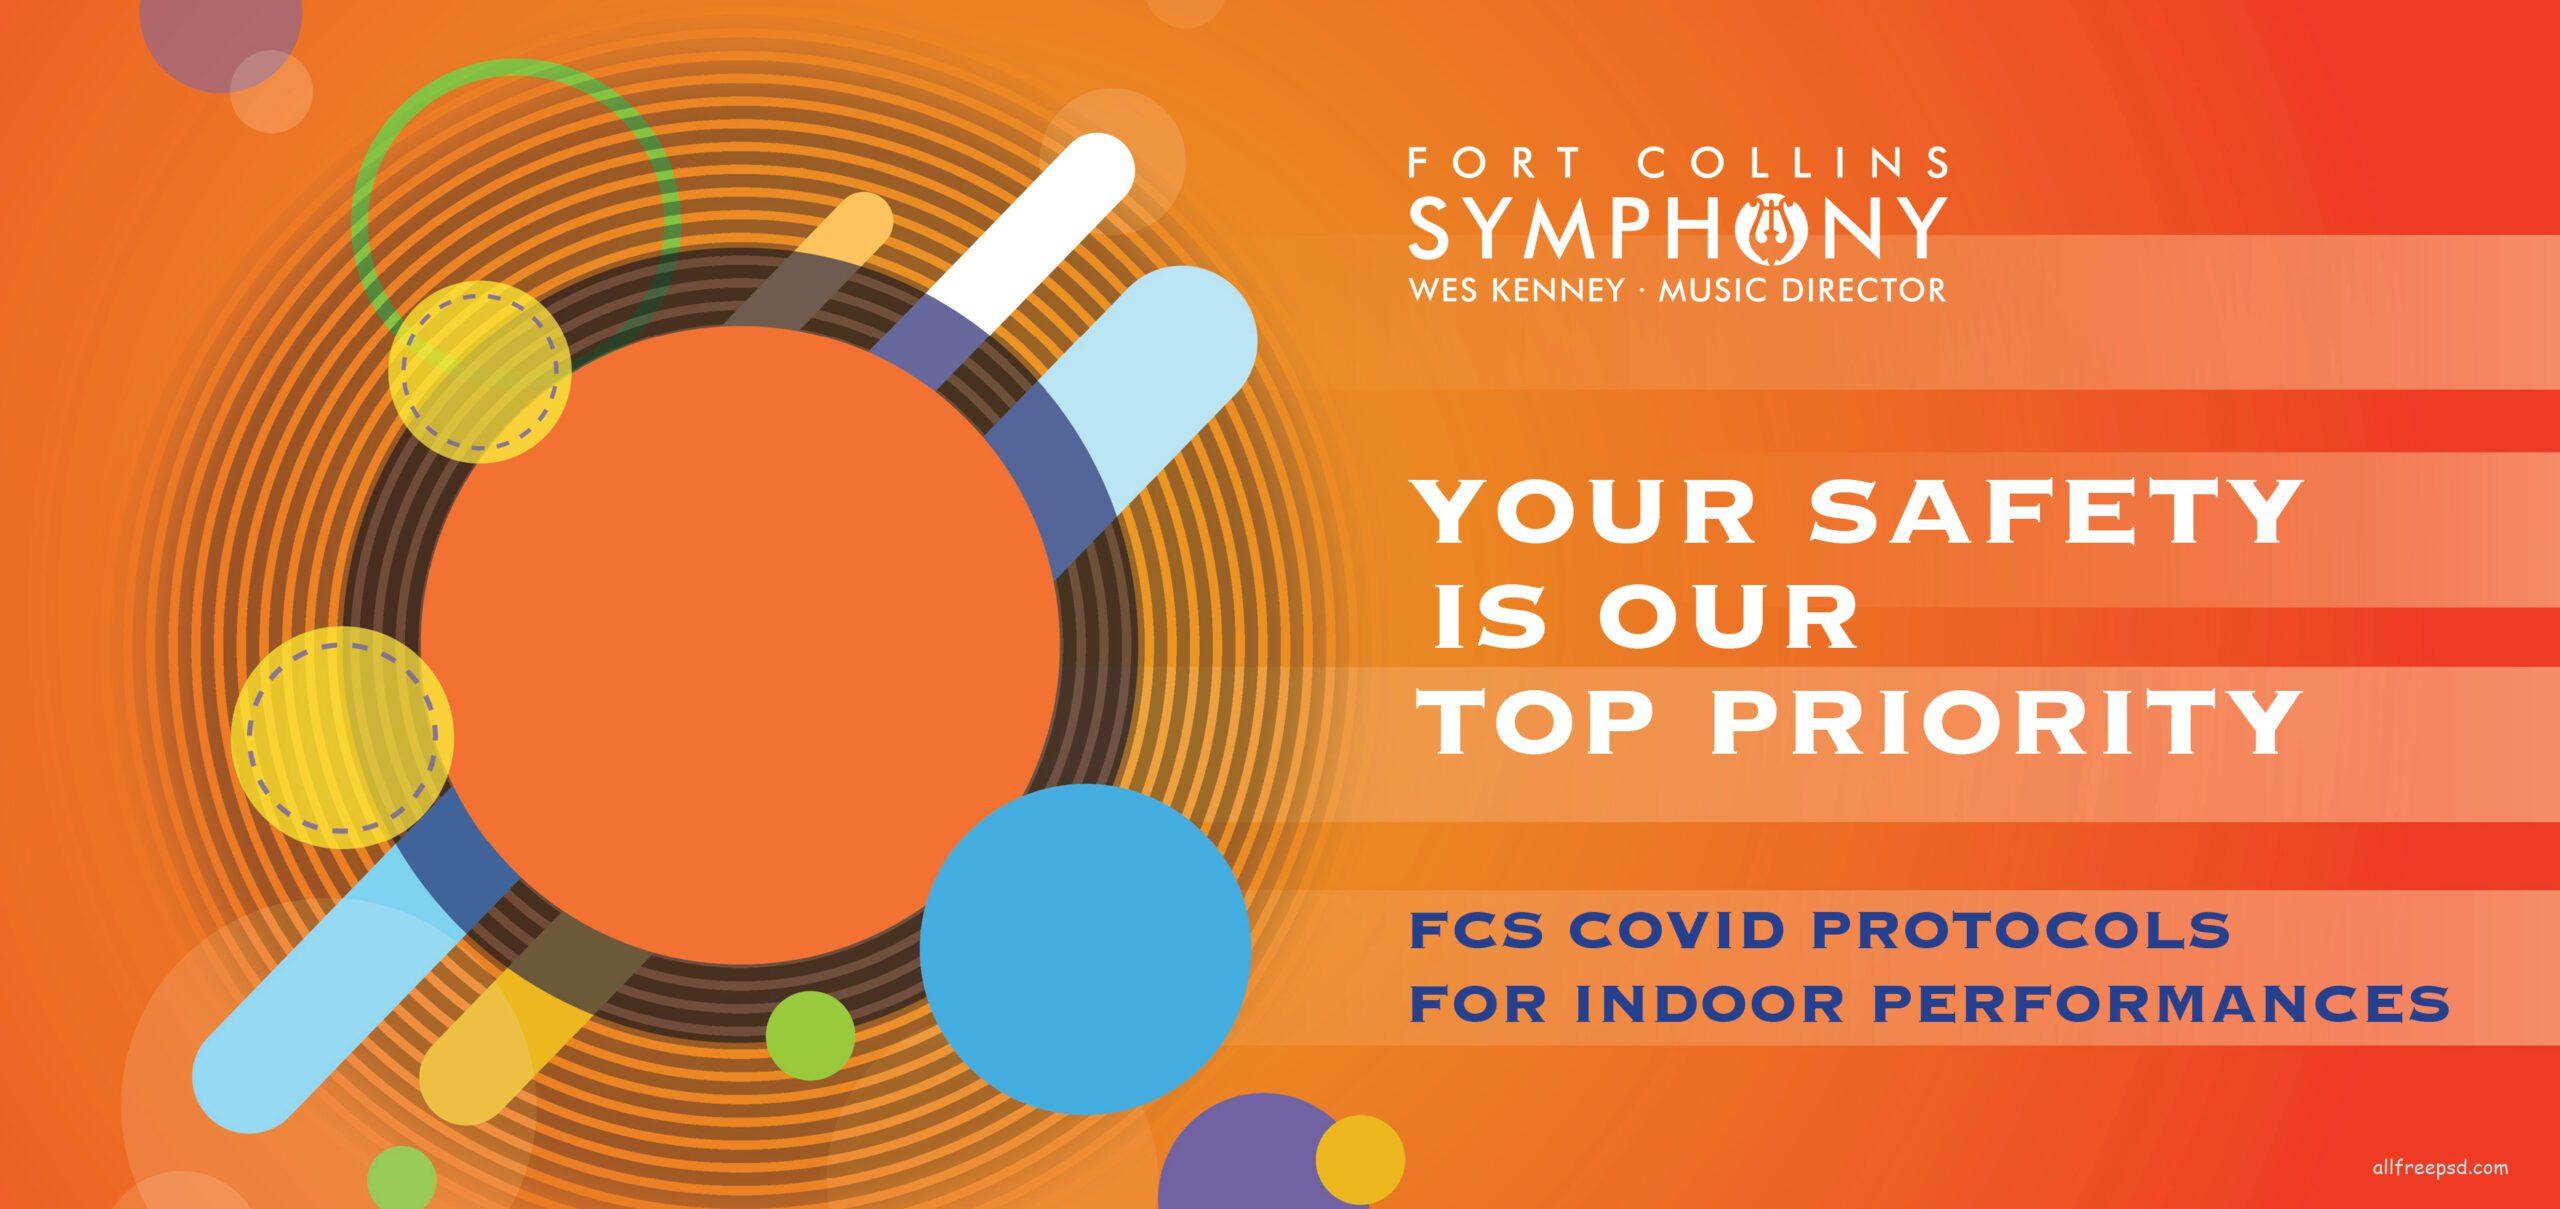 FCS Mask and Covid Protocols